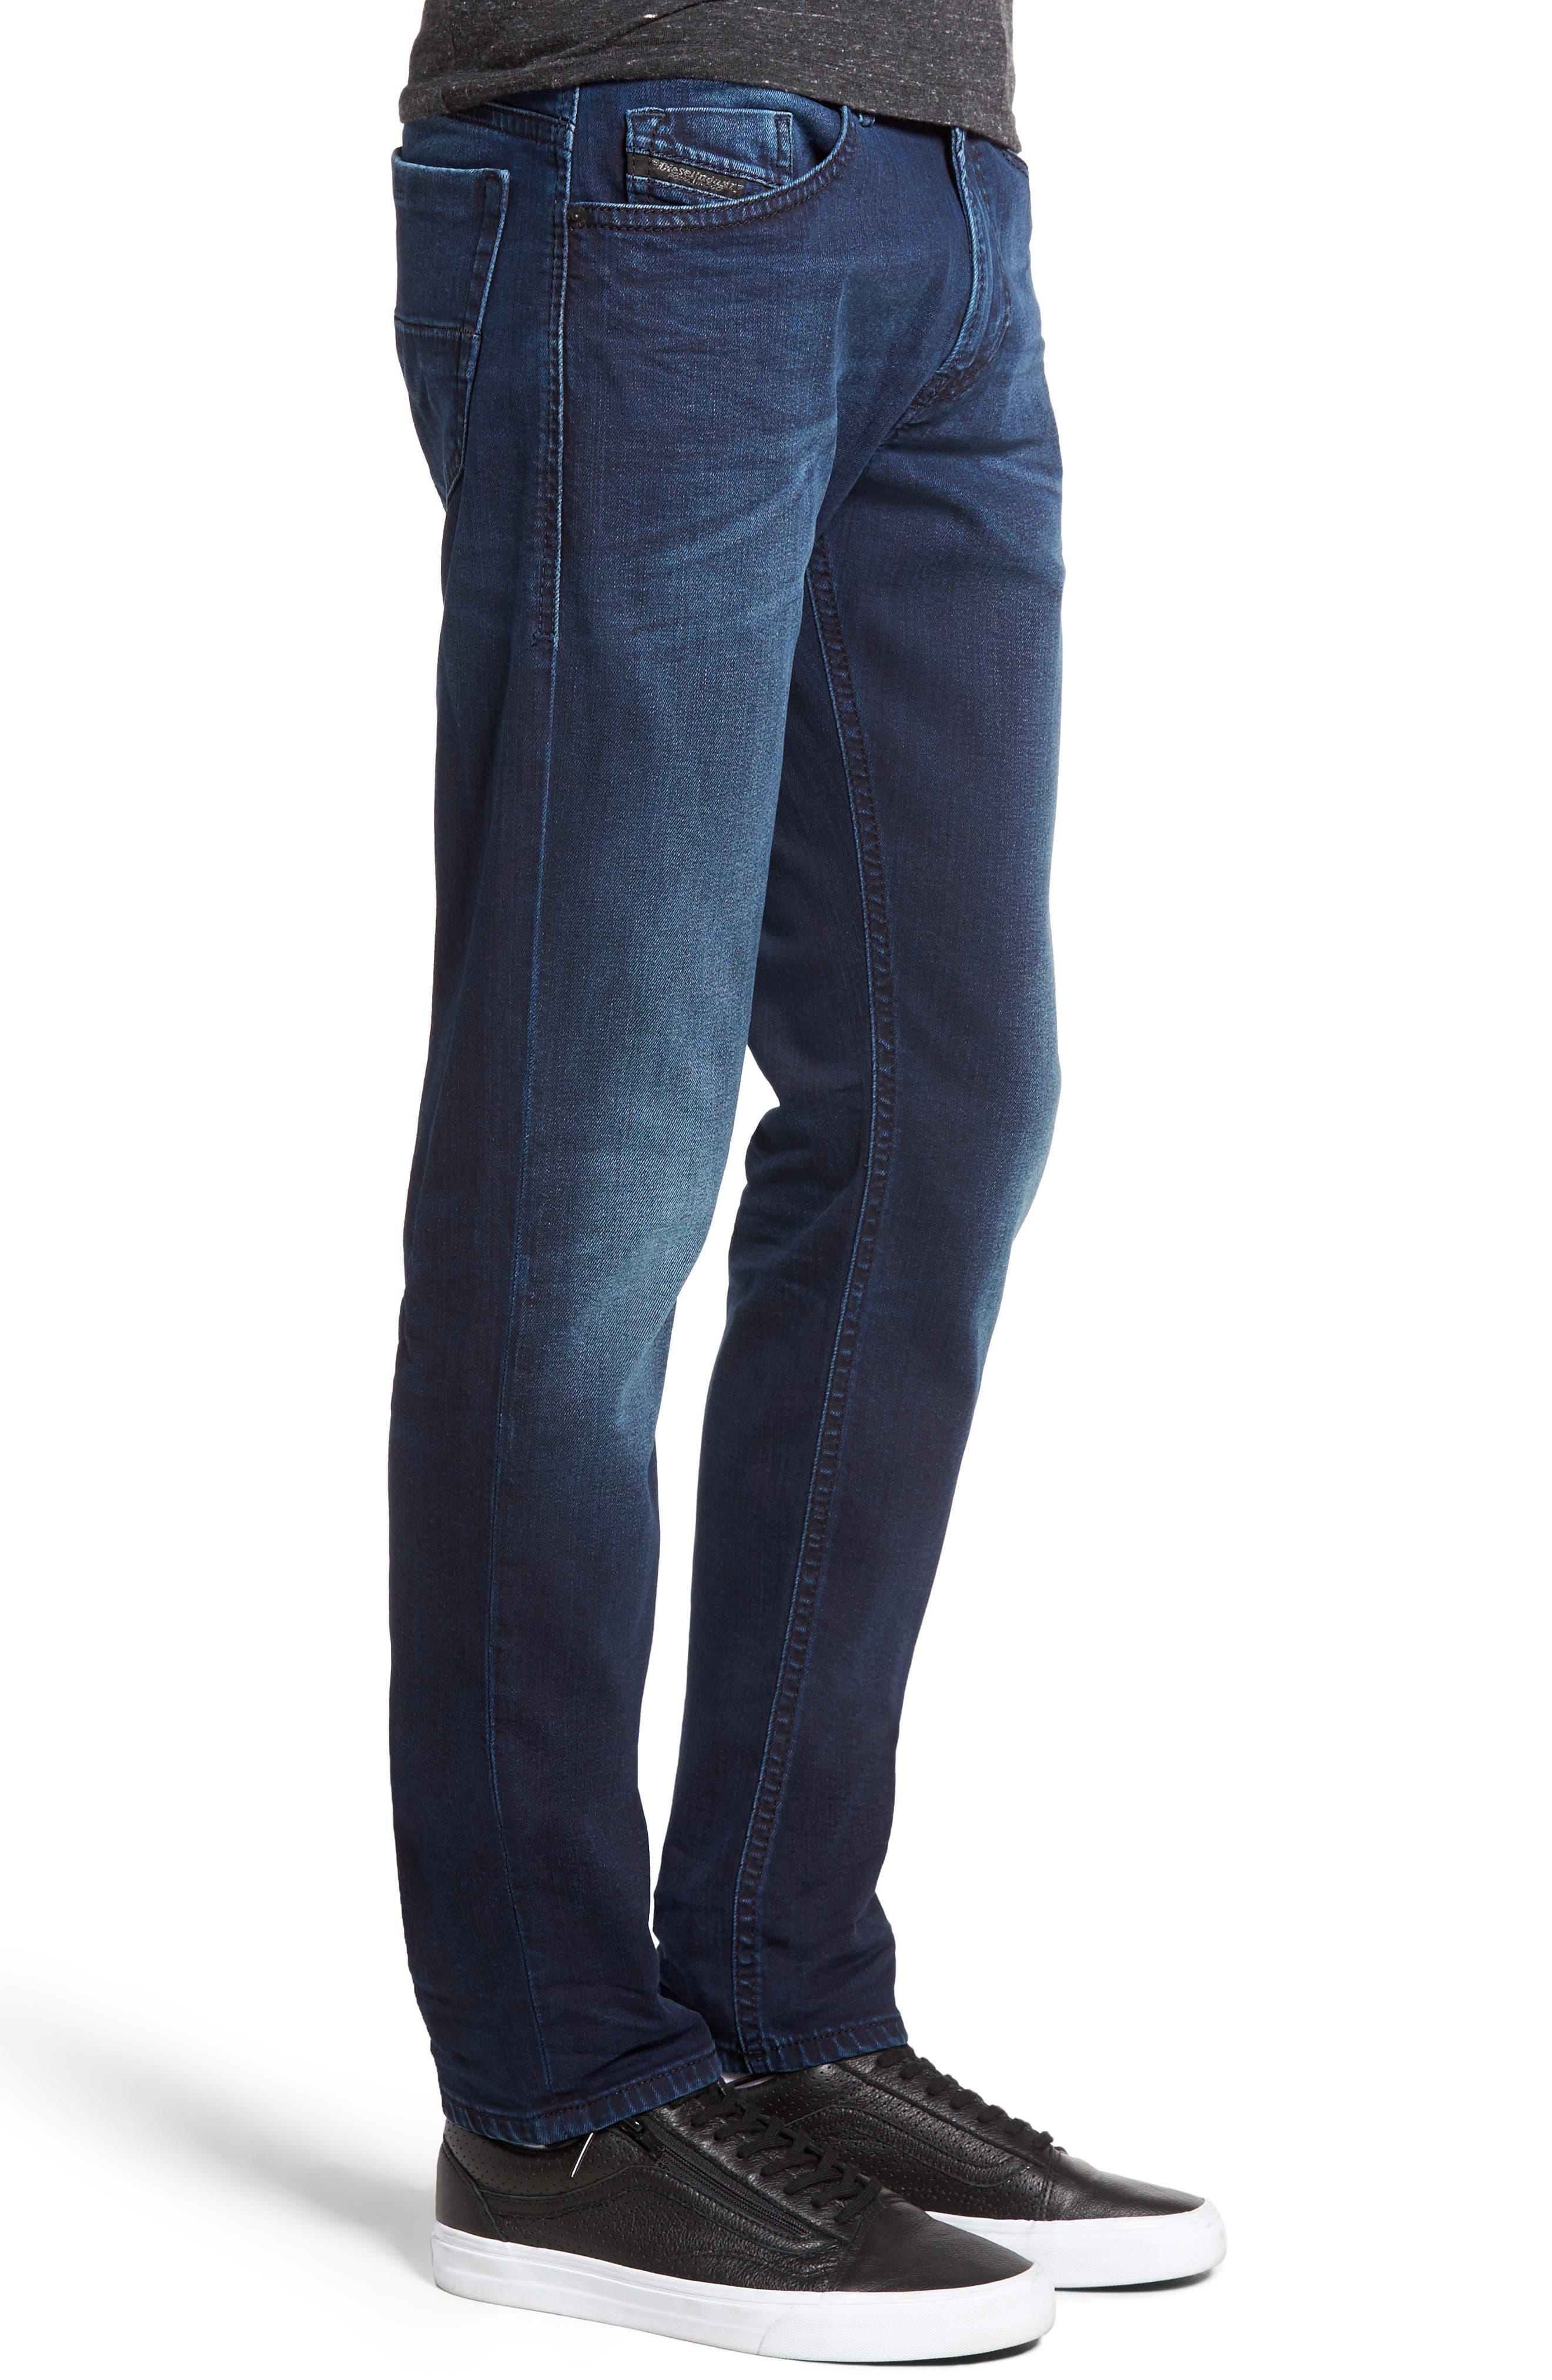 Thommer Skinny Fit Jeans,                             Alternate thumbnail 3, color,                             084Bv